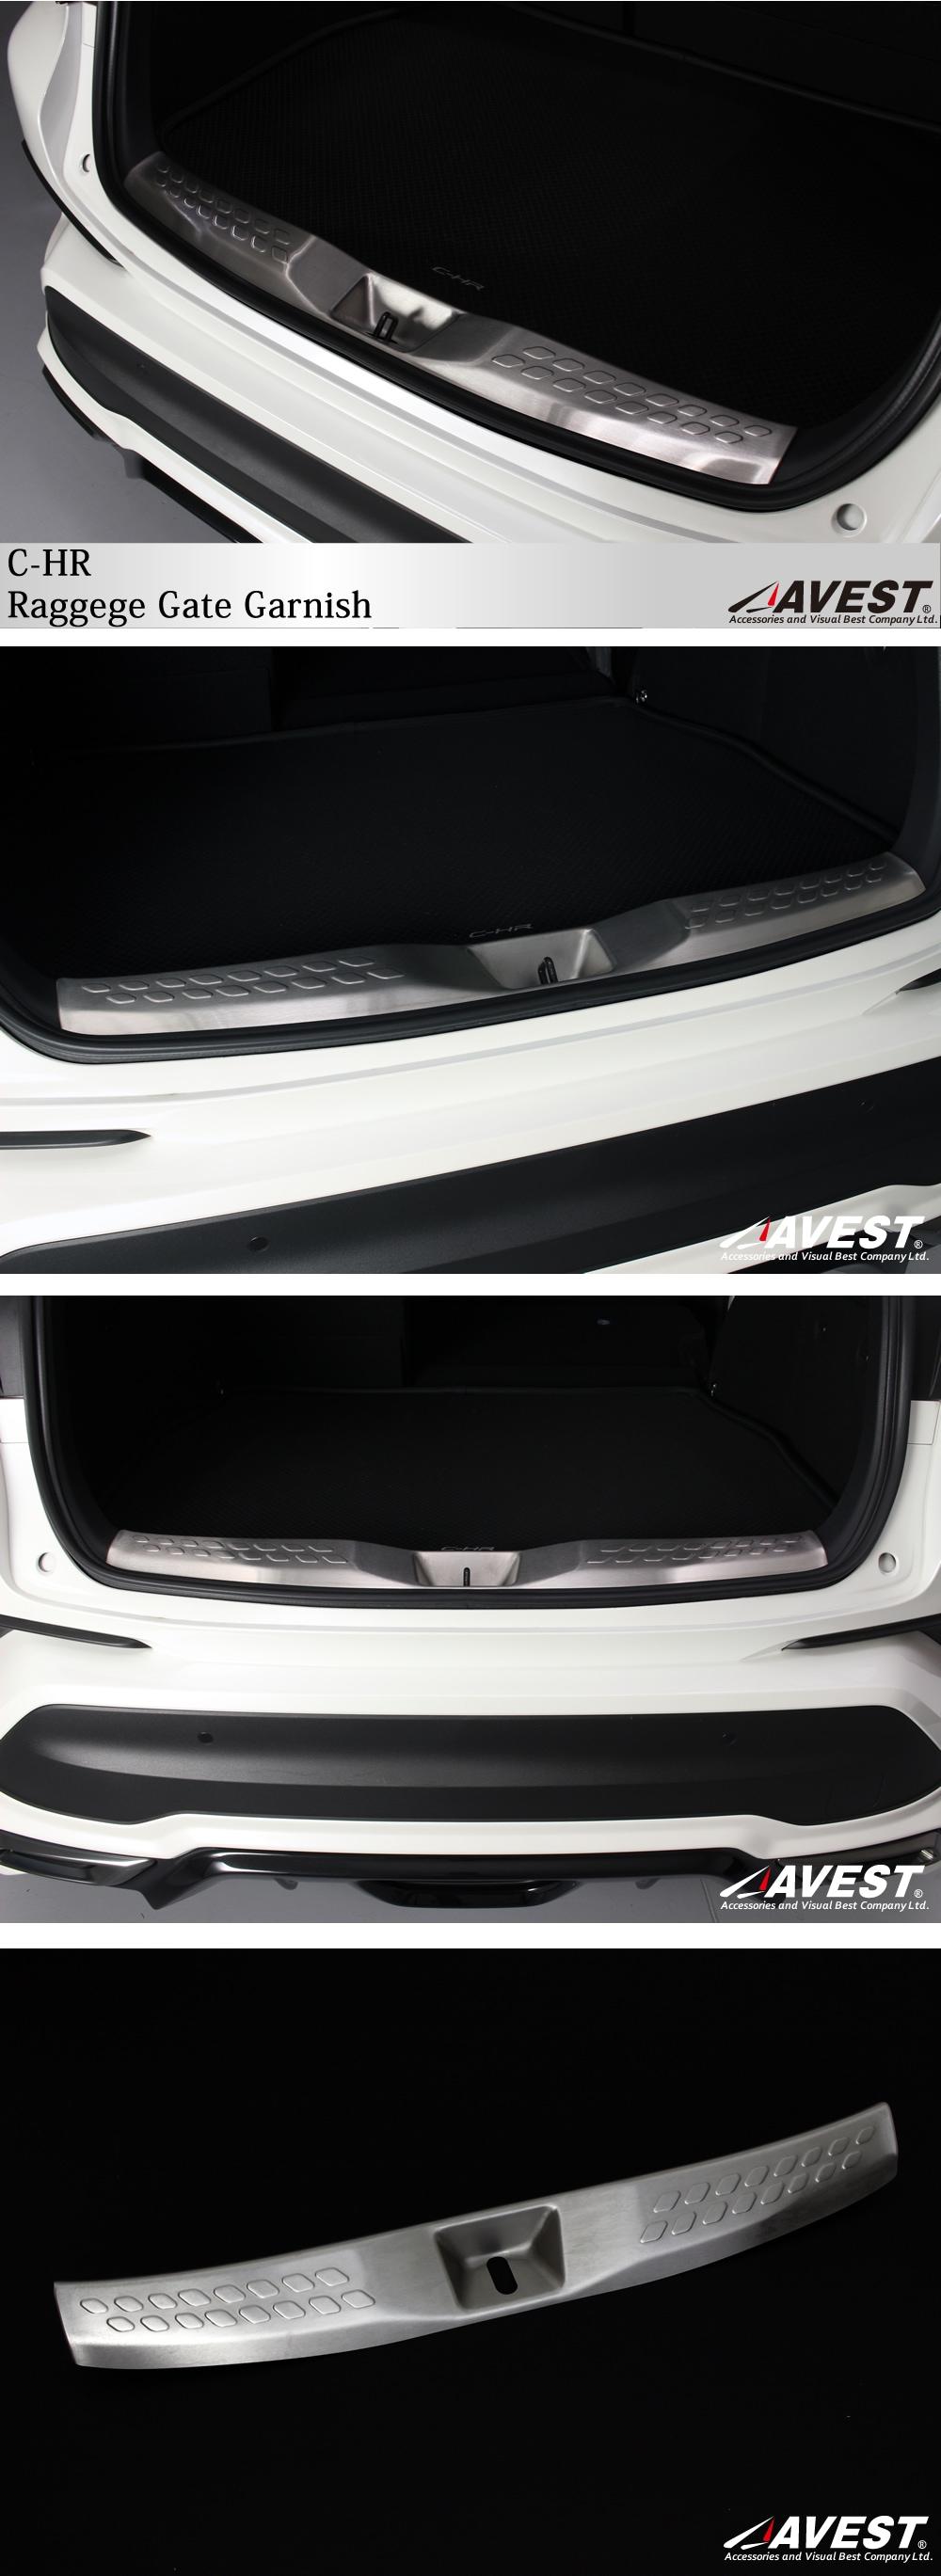 TOYOTA/C-HR/NGX50/ZYX10/ラゲッジステップの保護に/ガーニッシュ/トヨタ/外装/メッキ/パーツ